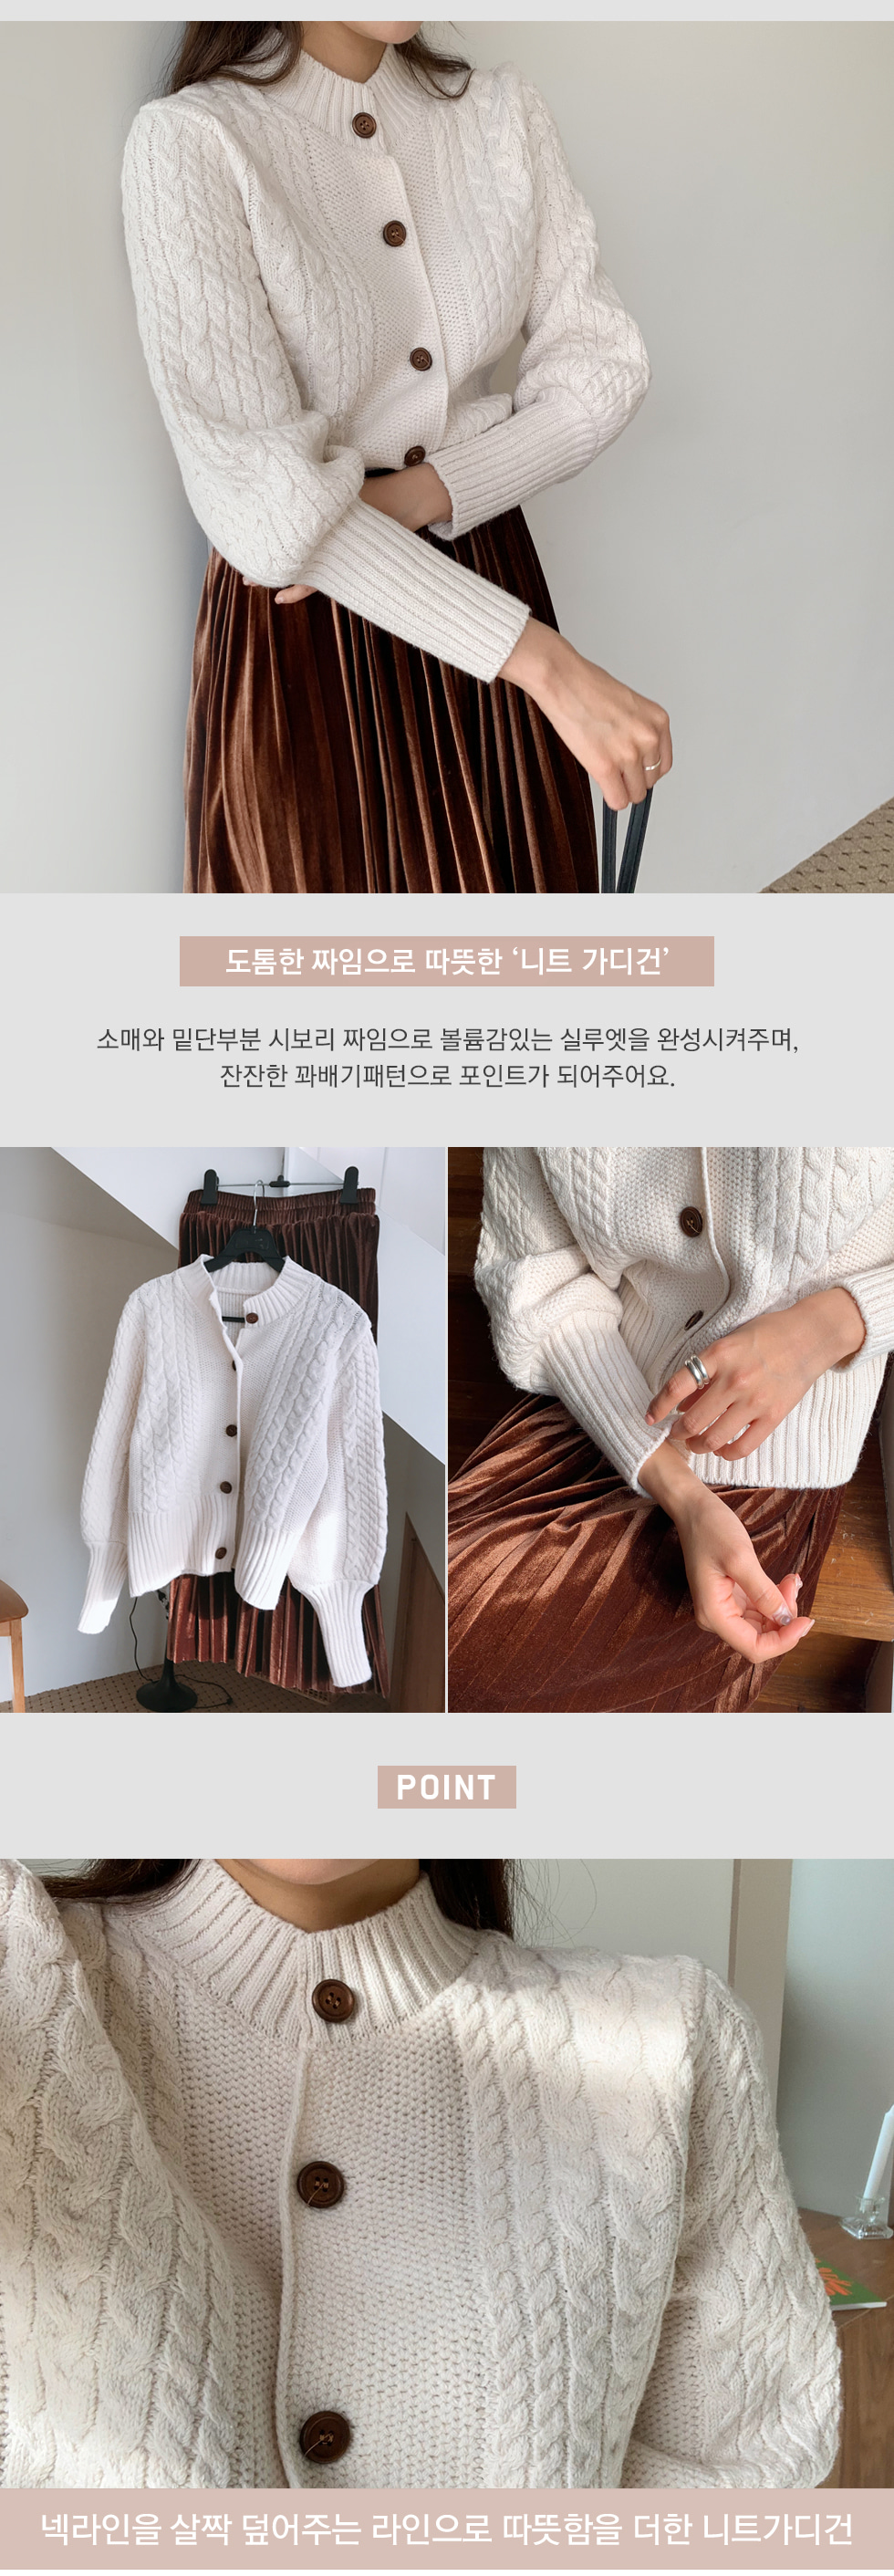 Bean sleeve knit cardigan